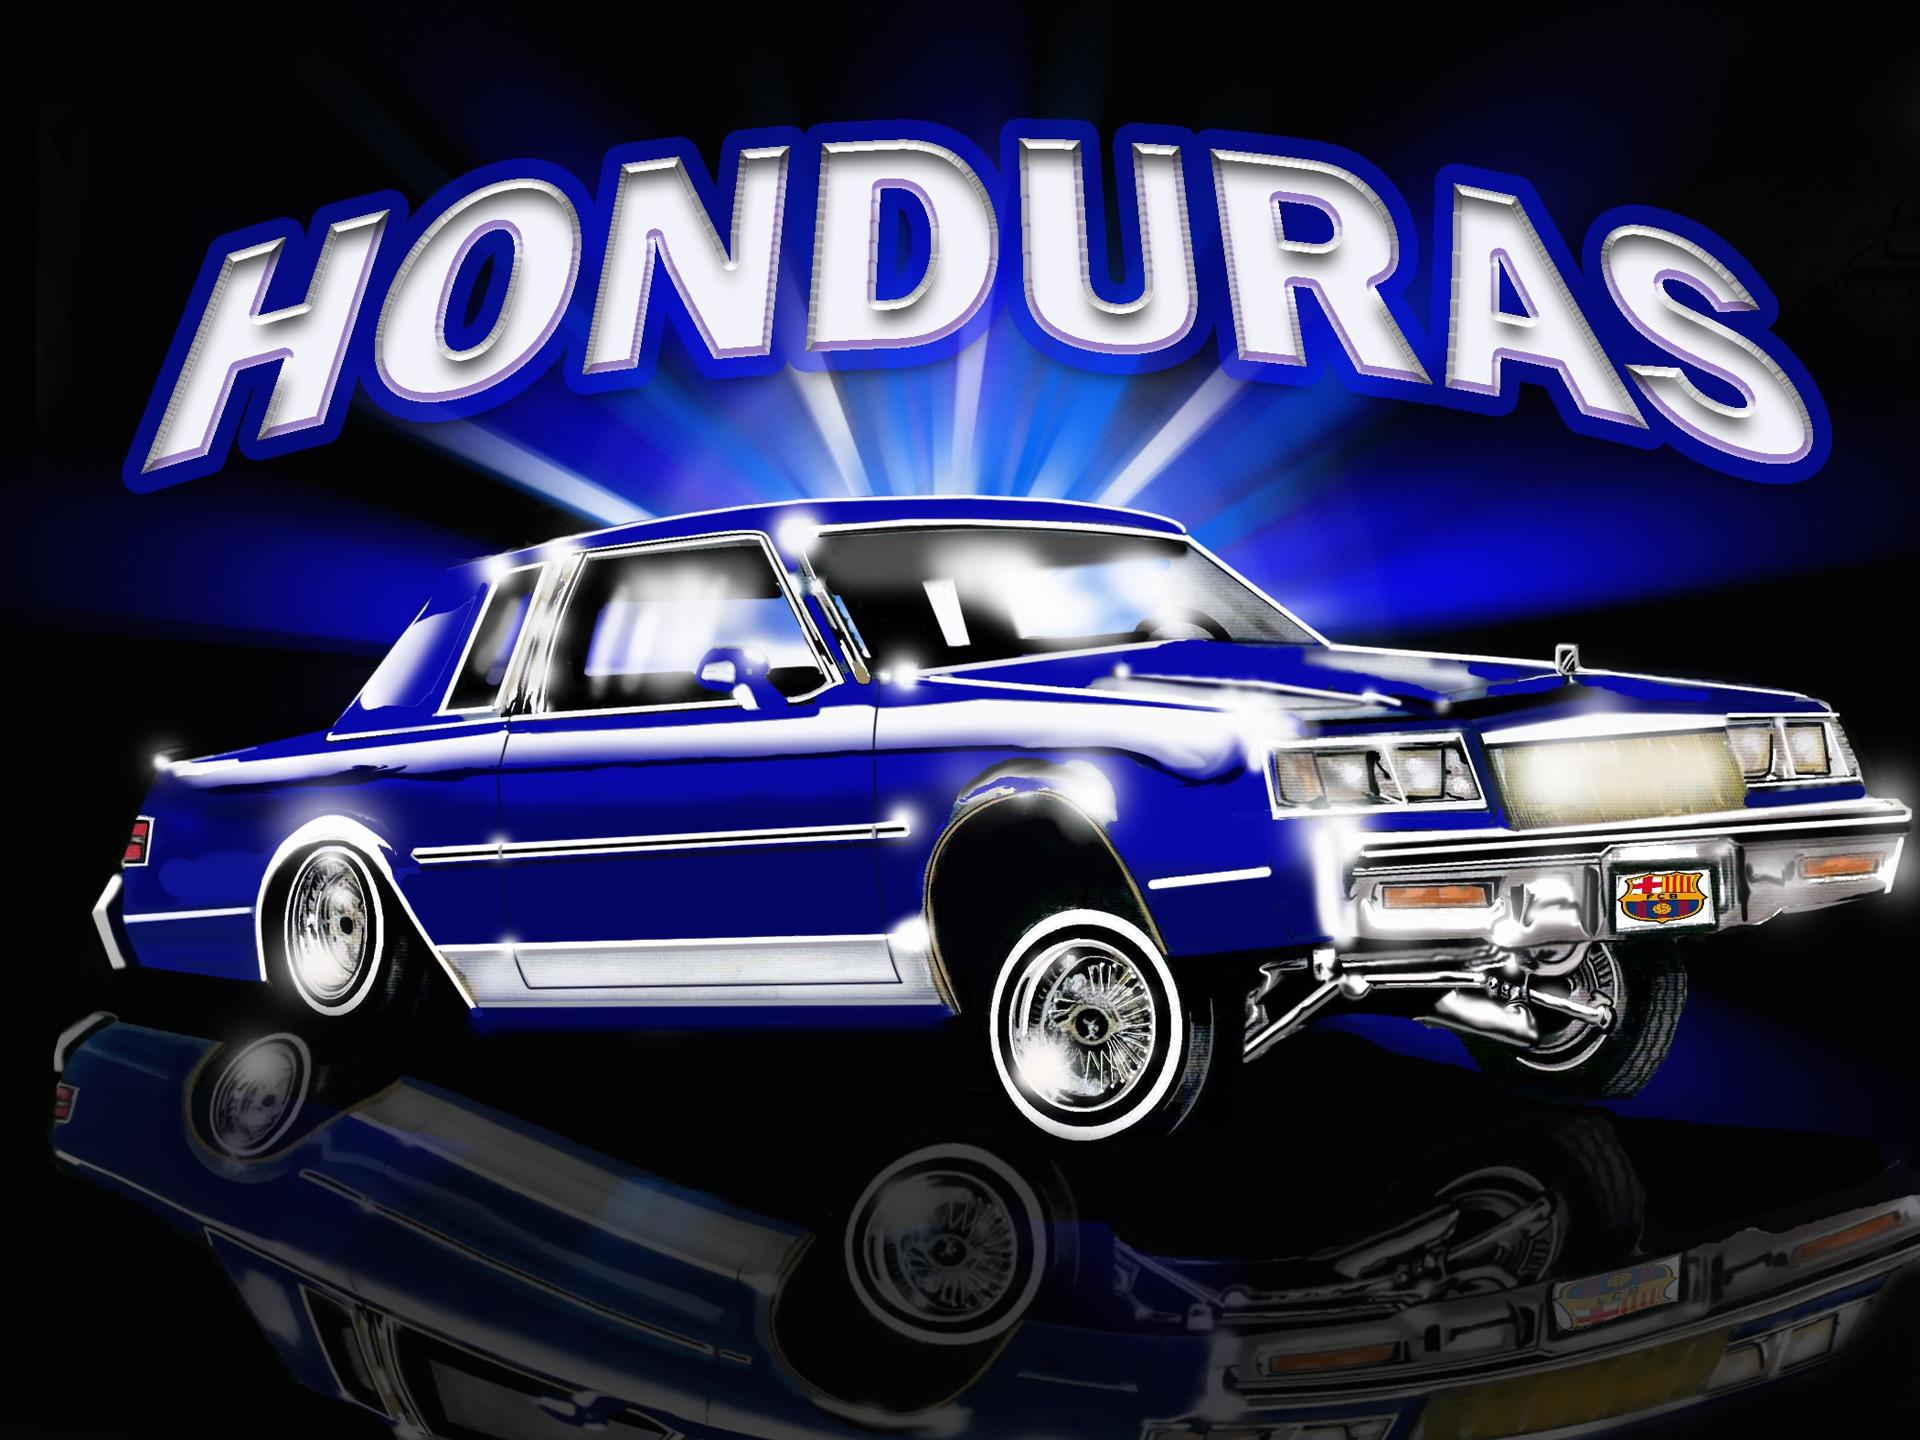 Download Honduras wallpaper